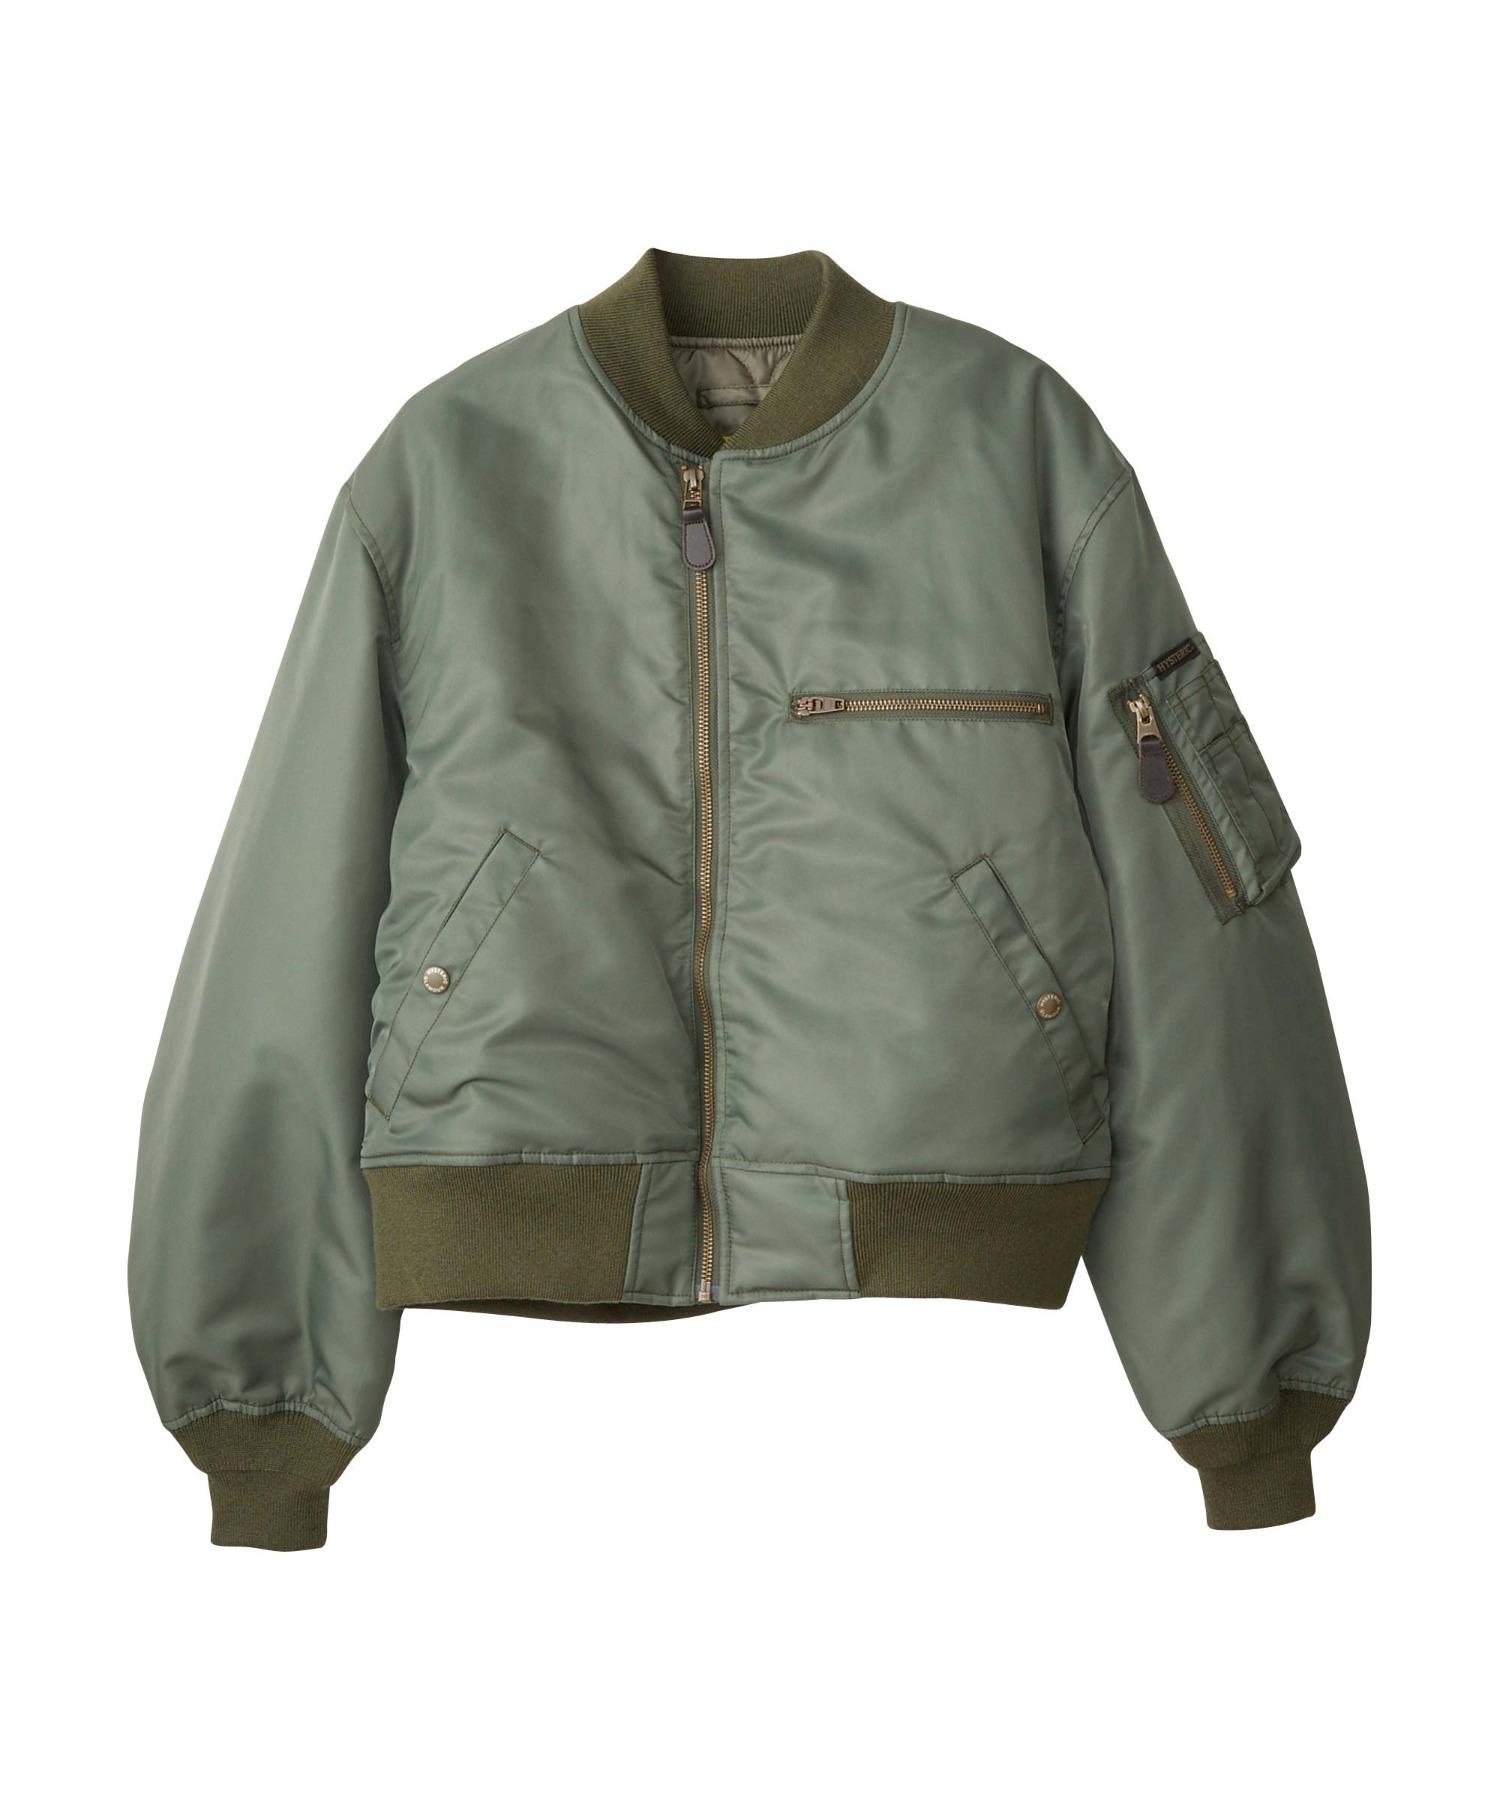 CIRCLEロゴ ショート丈MA-1ジャケット